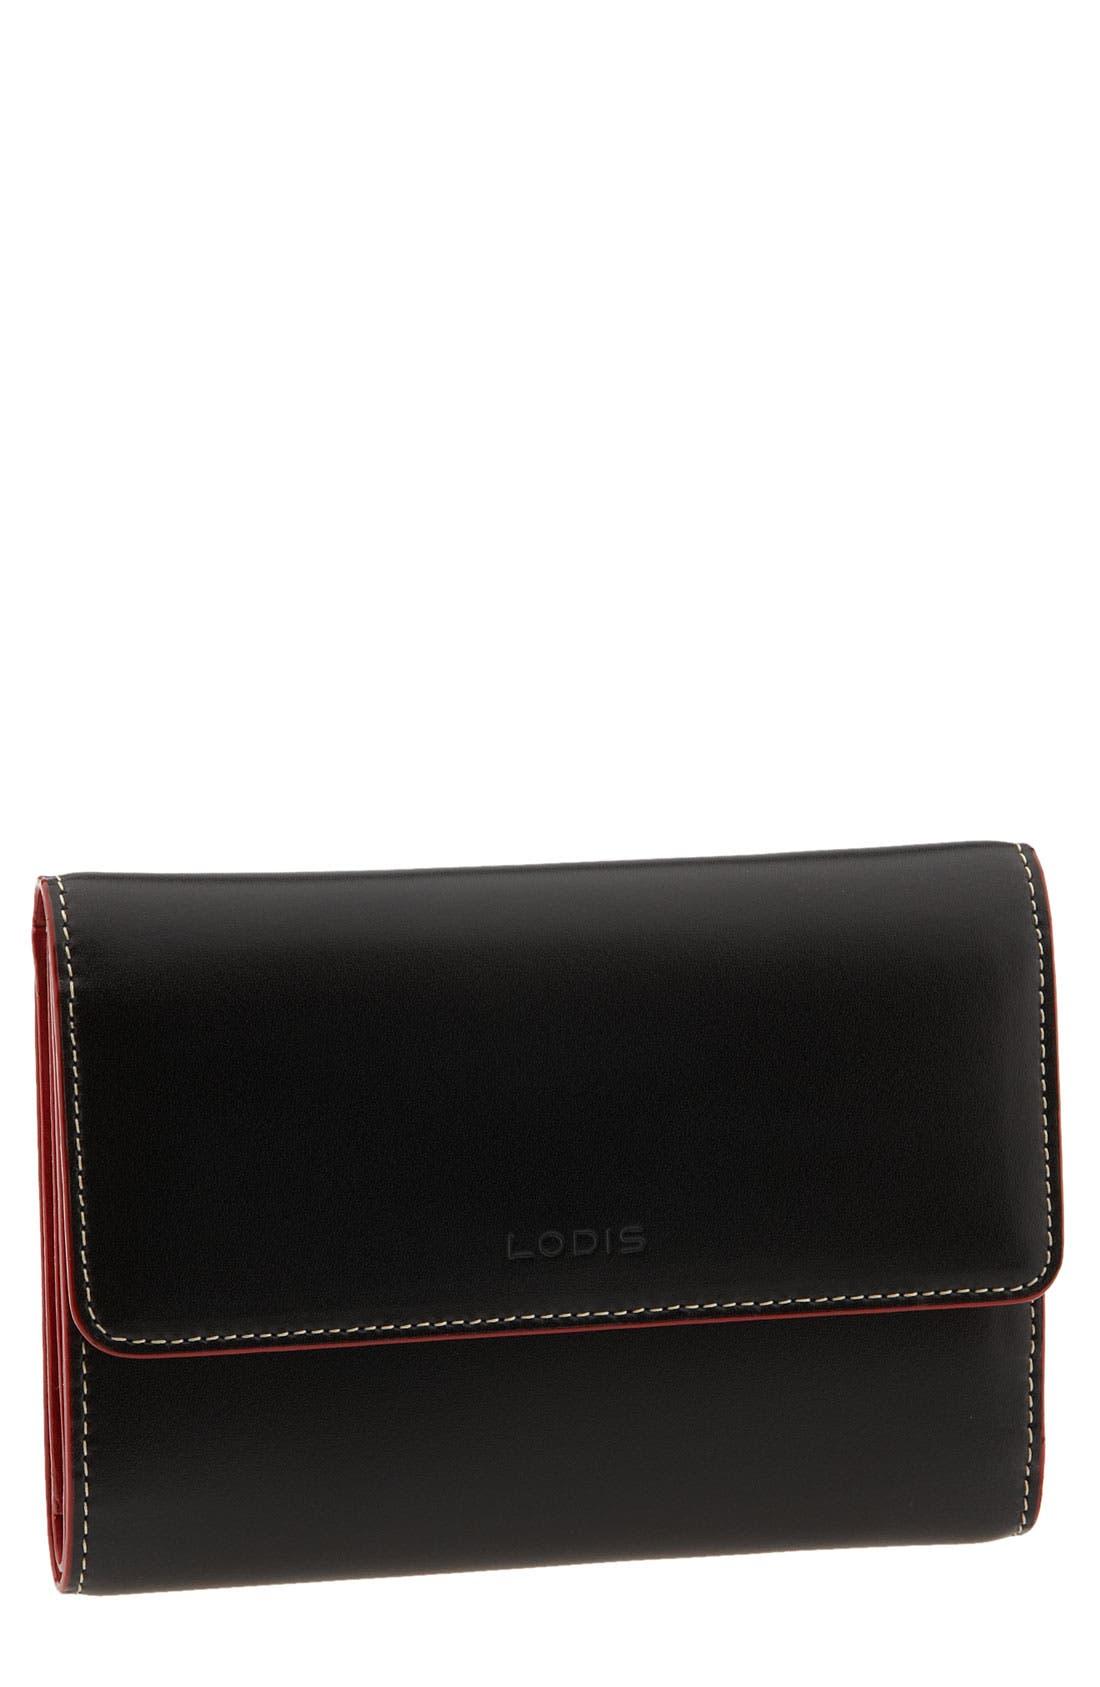 Lodis 'Audrey' Continental Wallet,                             Main thumbnail 1, color,                             002